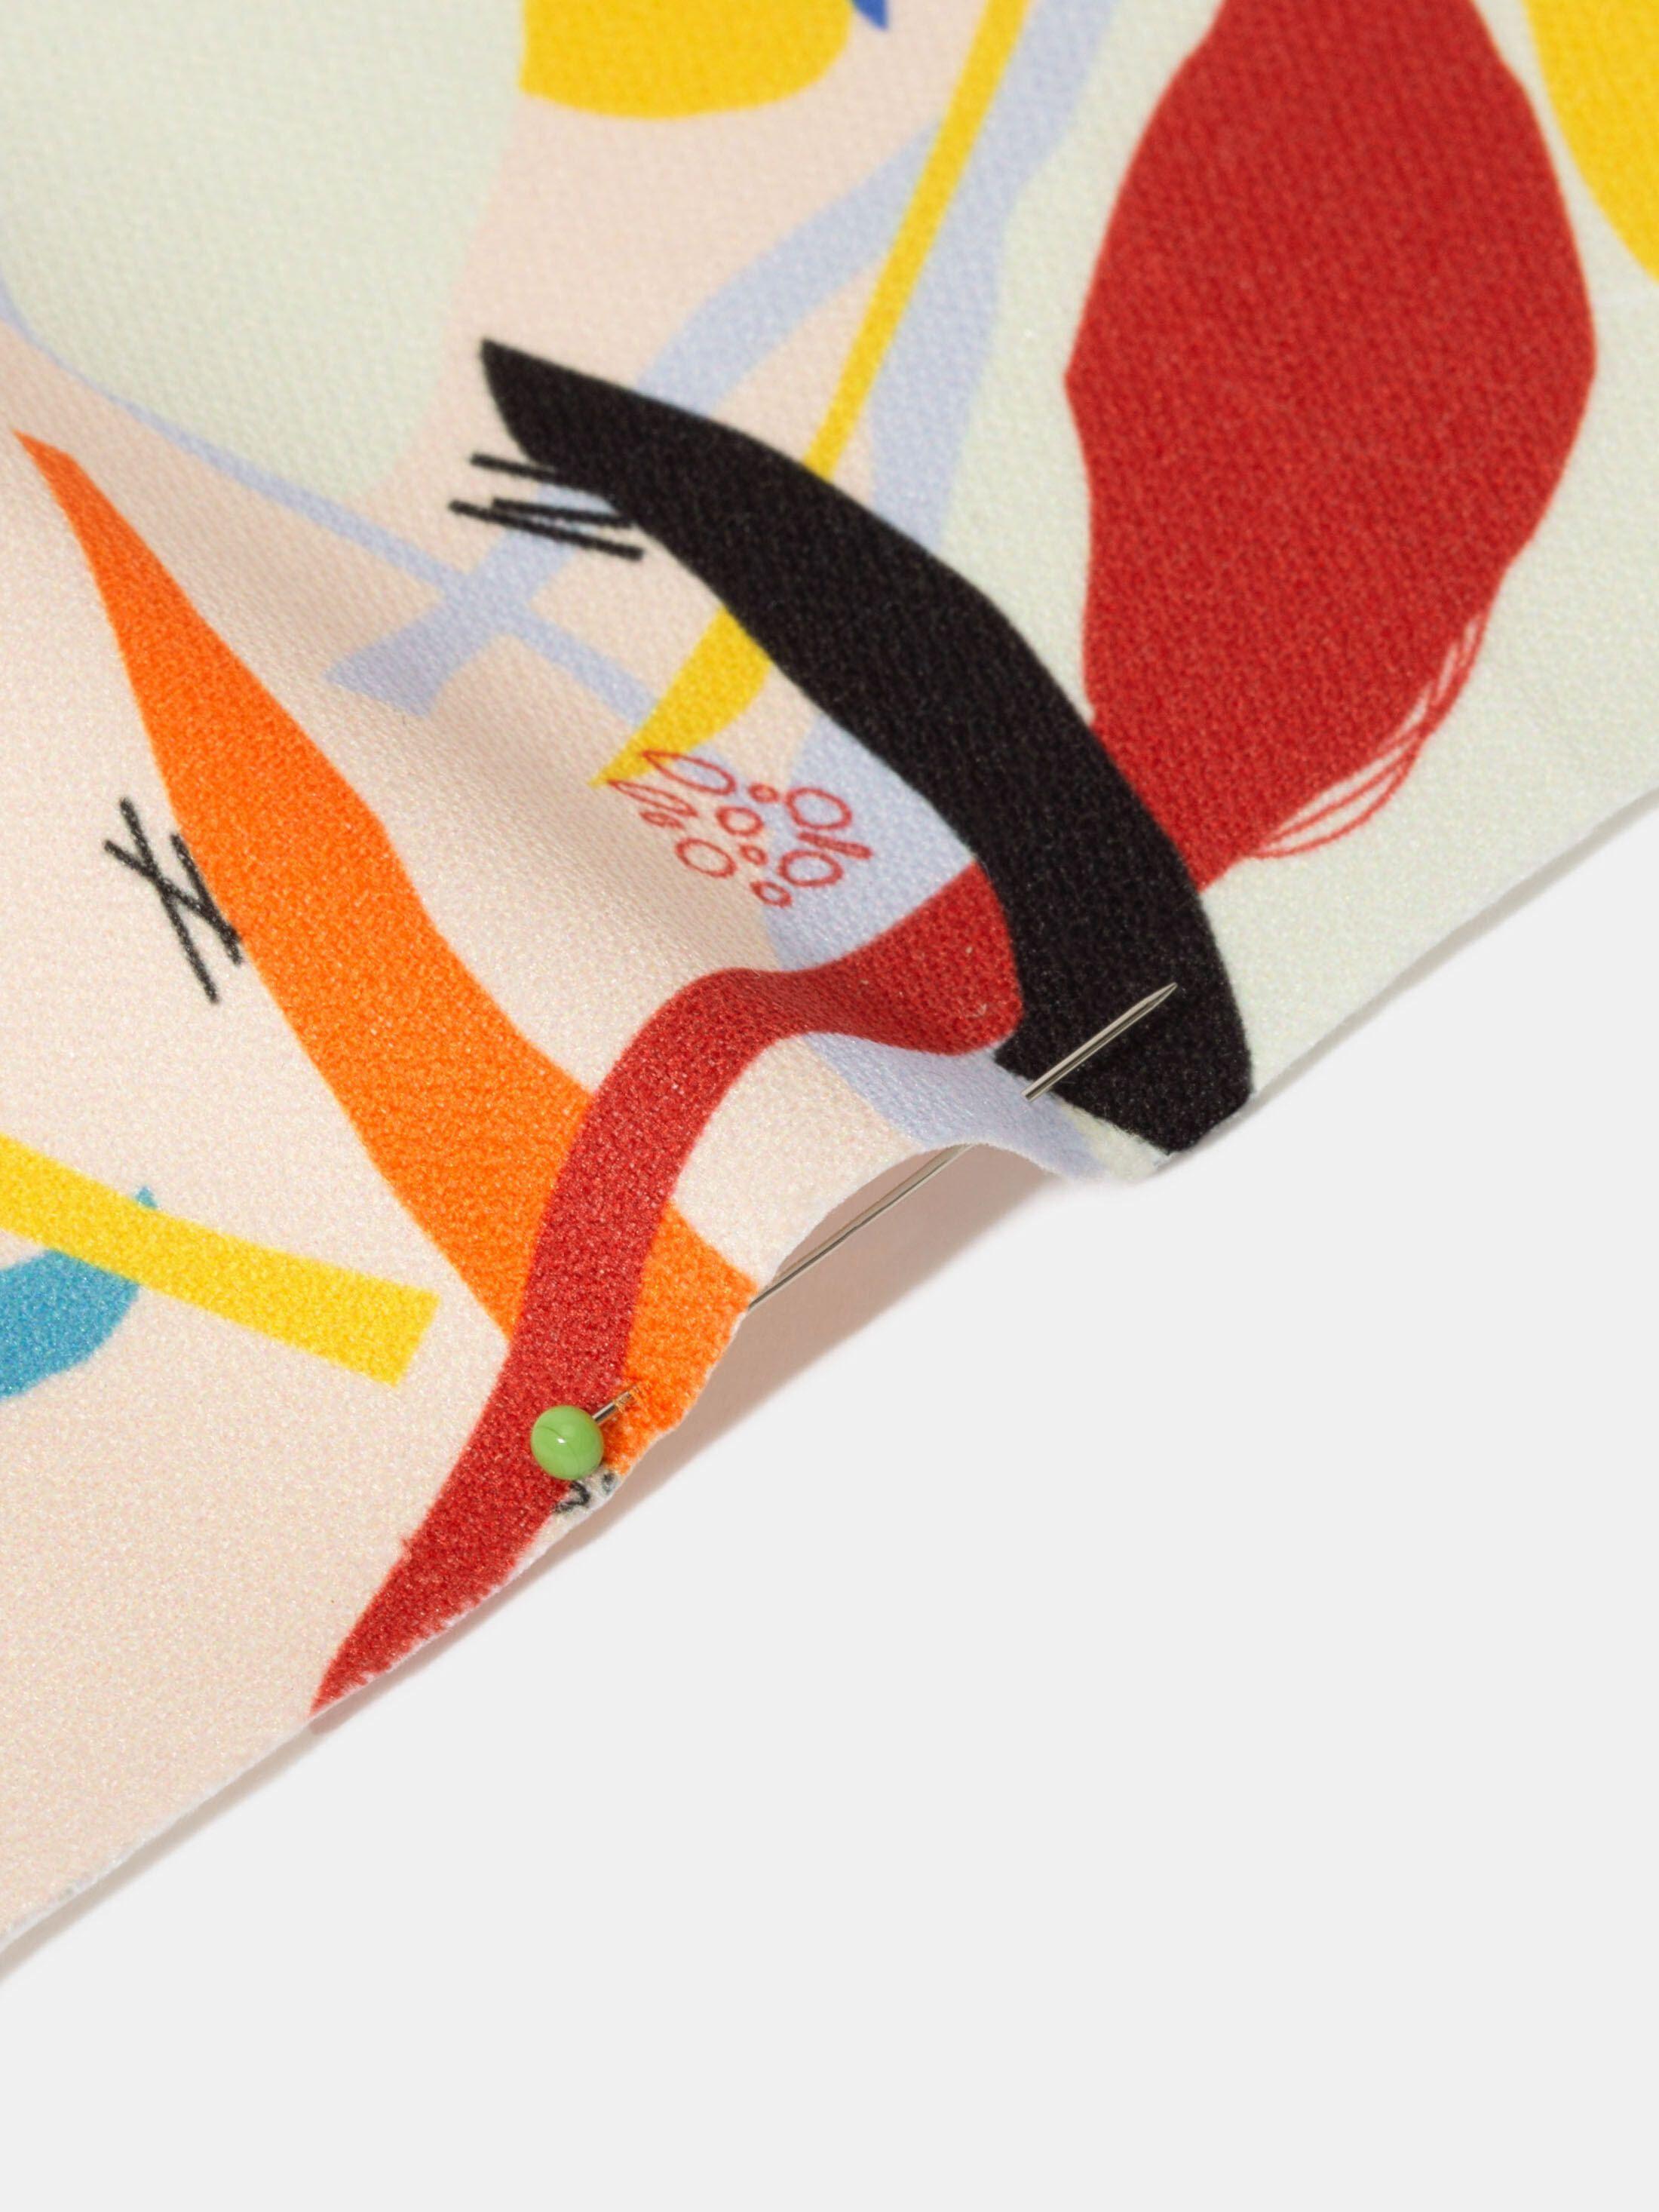 digital printing on Lima Cotton Twill fabric